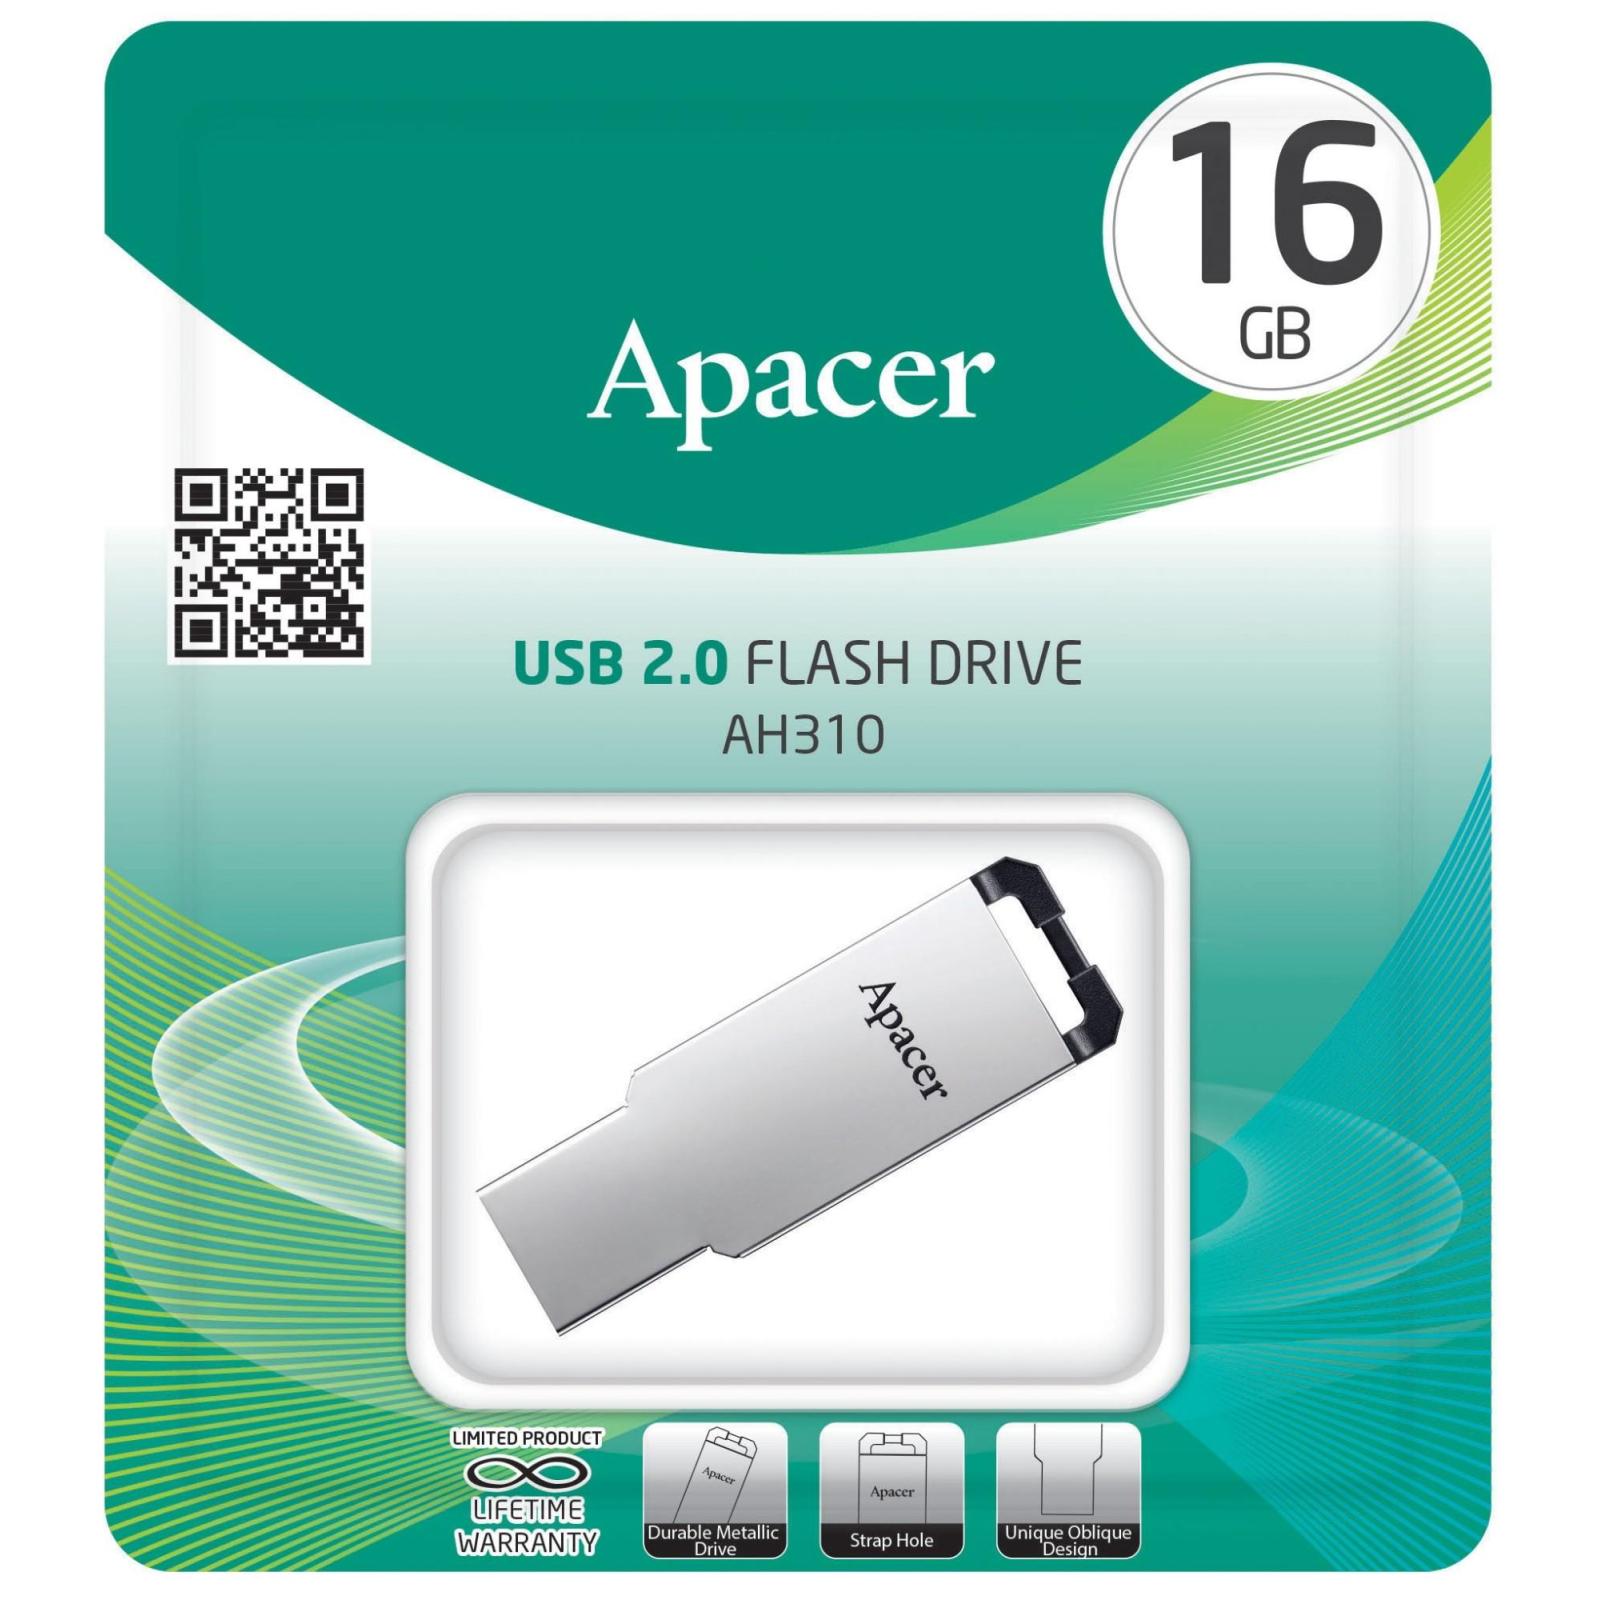 USB флеш накопитель Apacer 16GB AH310 Silver USB 2.0 (AP16GAH310S-1) изображение 3